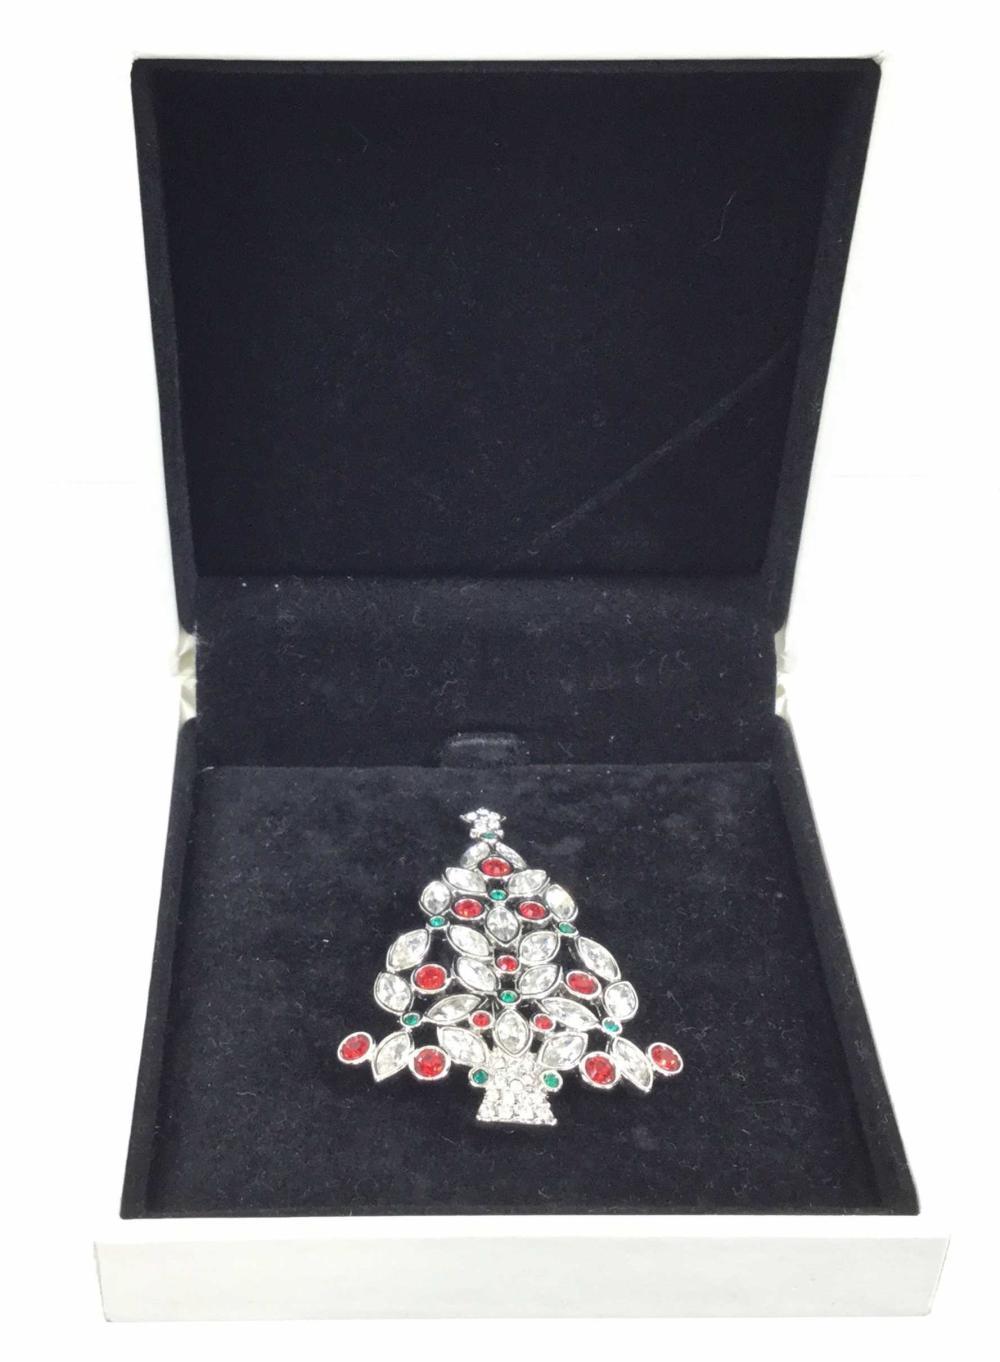 Swarovski Signed Christmas Tree Brooch